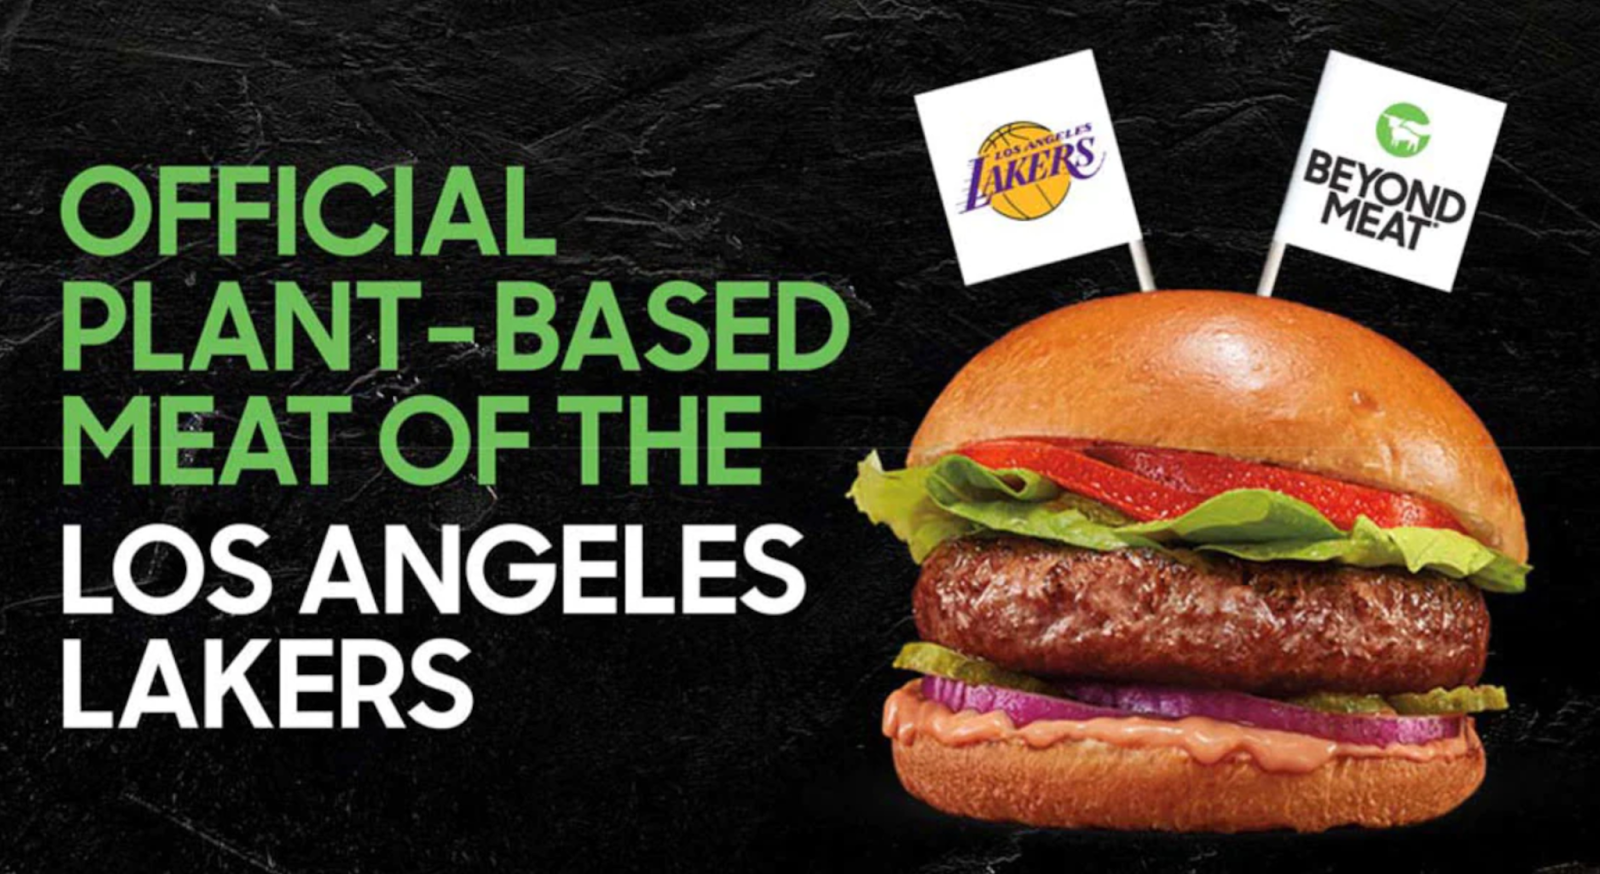 LA Lakers' plant-based burger